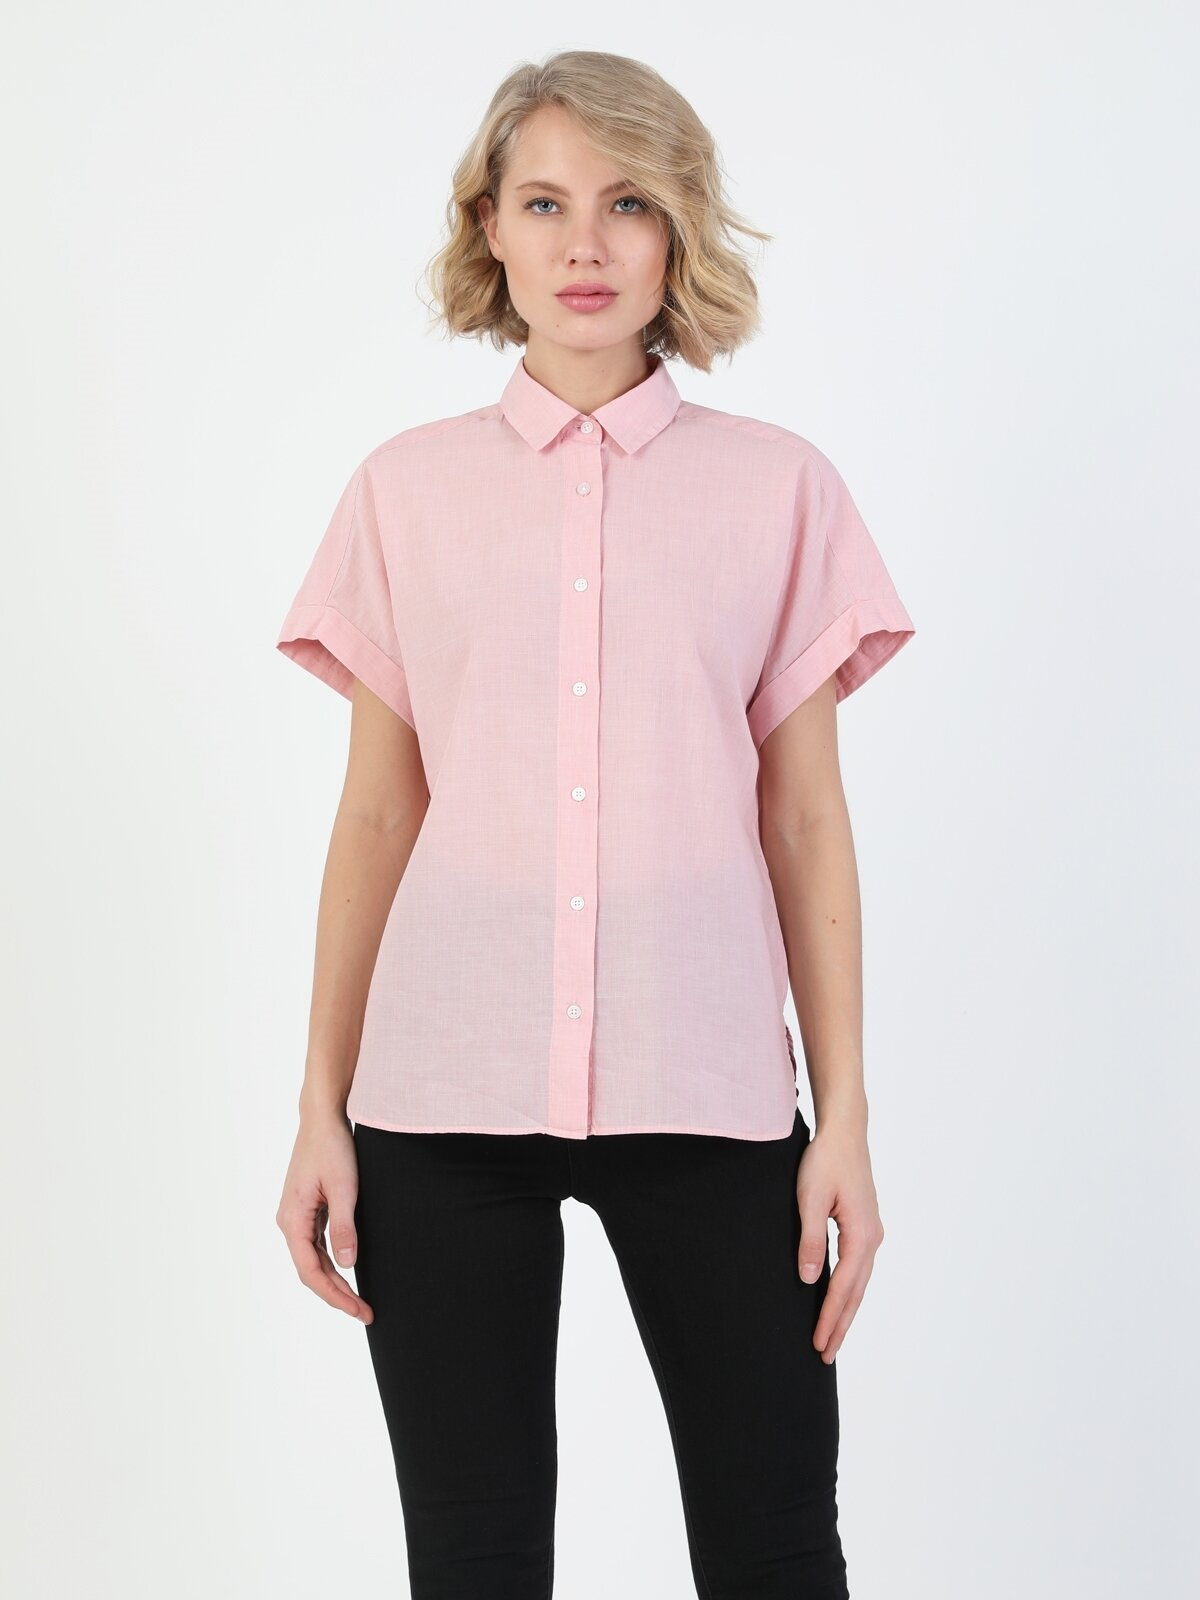 Regular Fit Shirt Neck Kadın Pembe Kısa Kol Gömlek